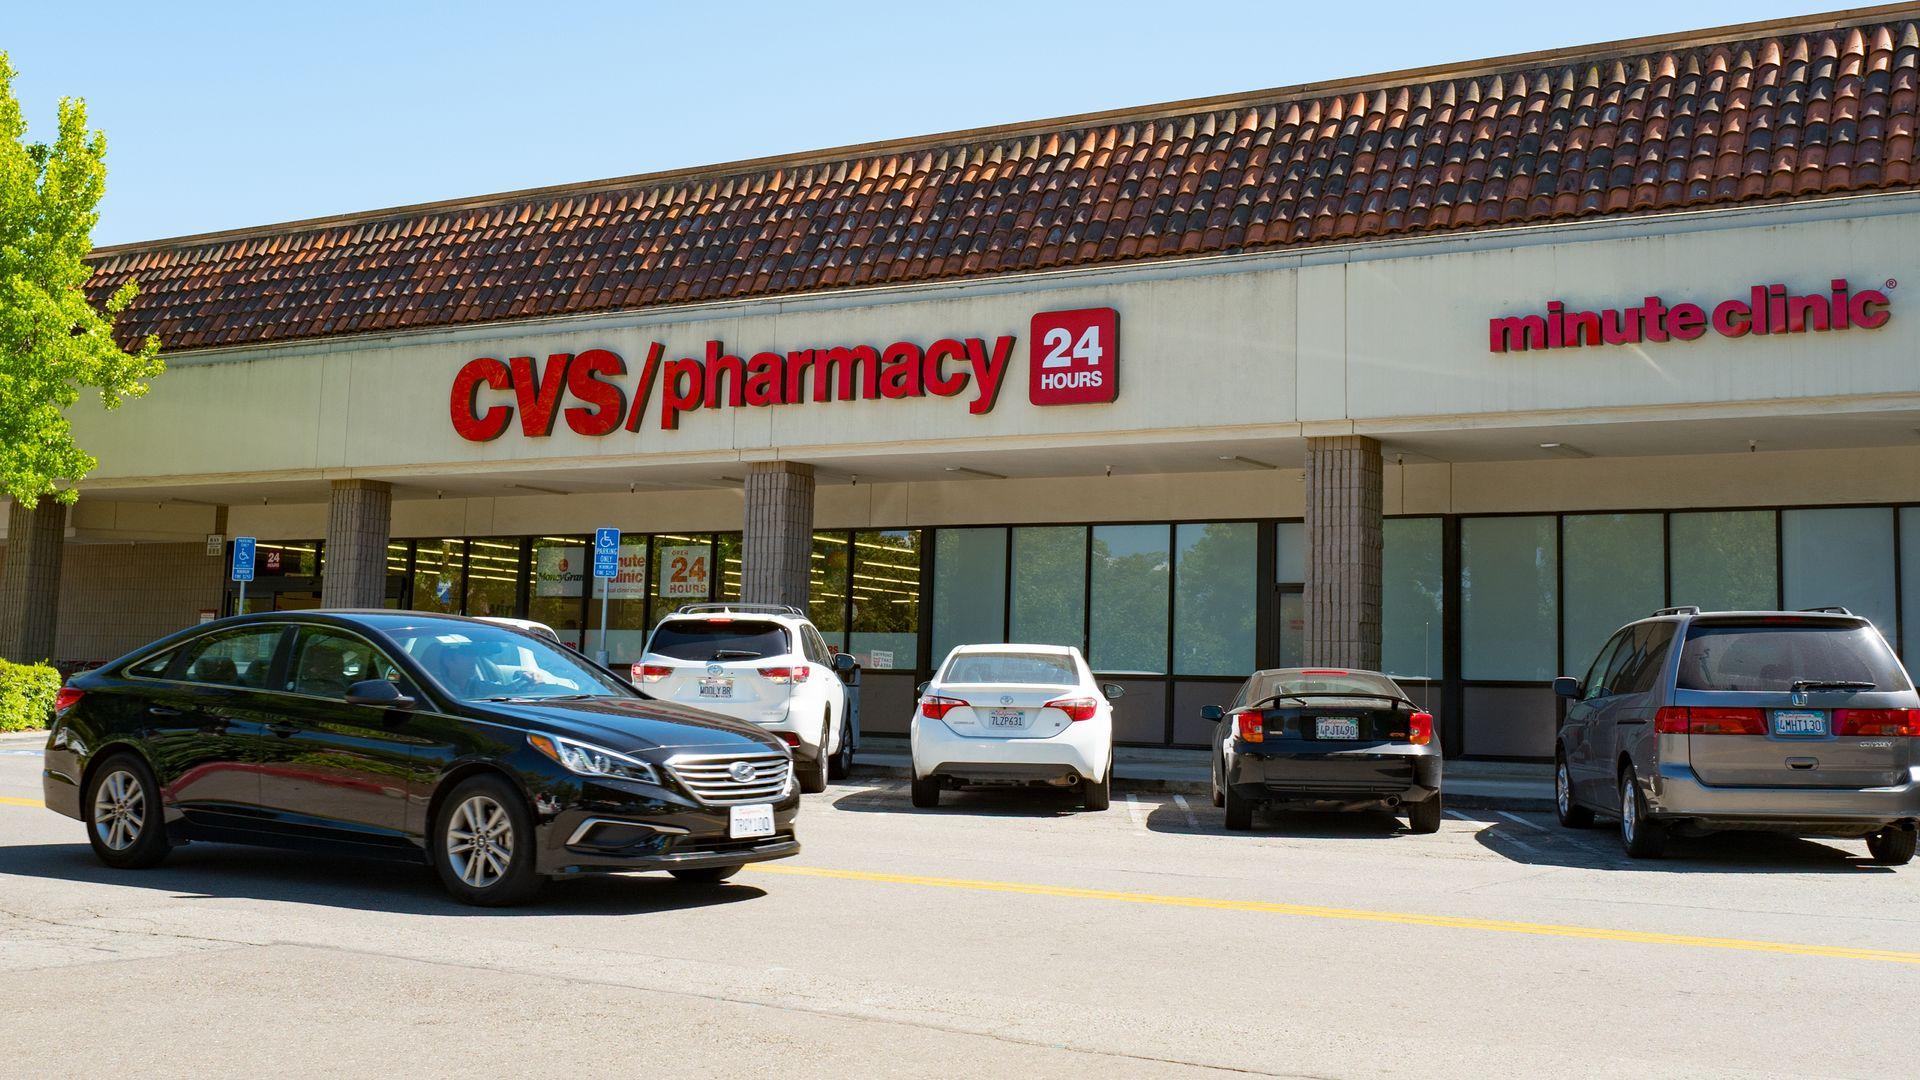 CVS Pharmacy on a sunny day in San Ramon, California